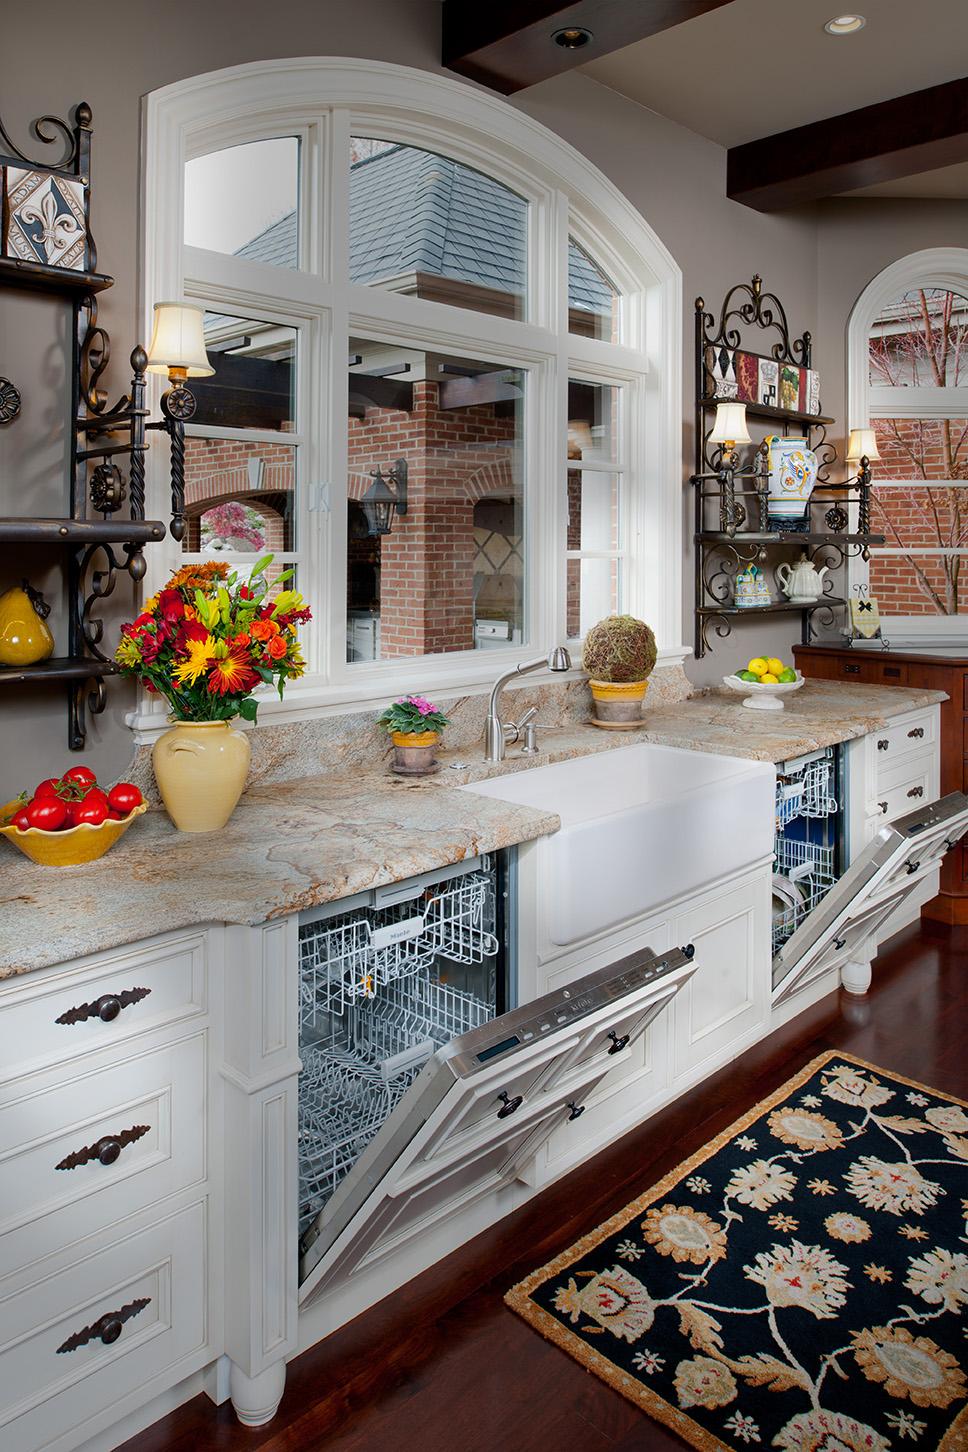 kitchen_bath_concepts_wholehome7_5.jpg